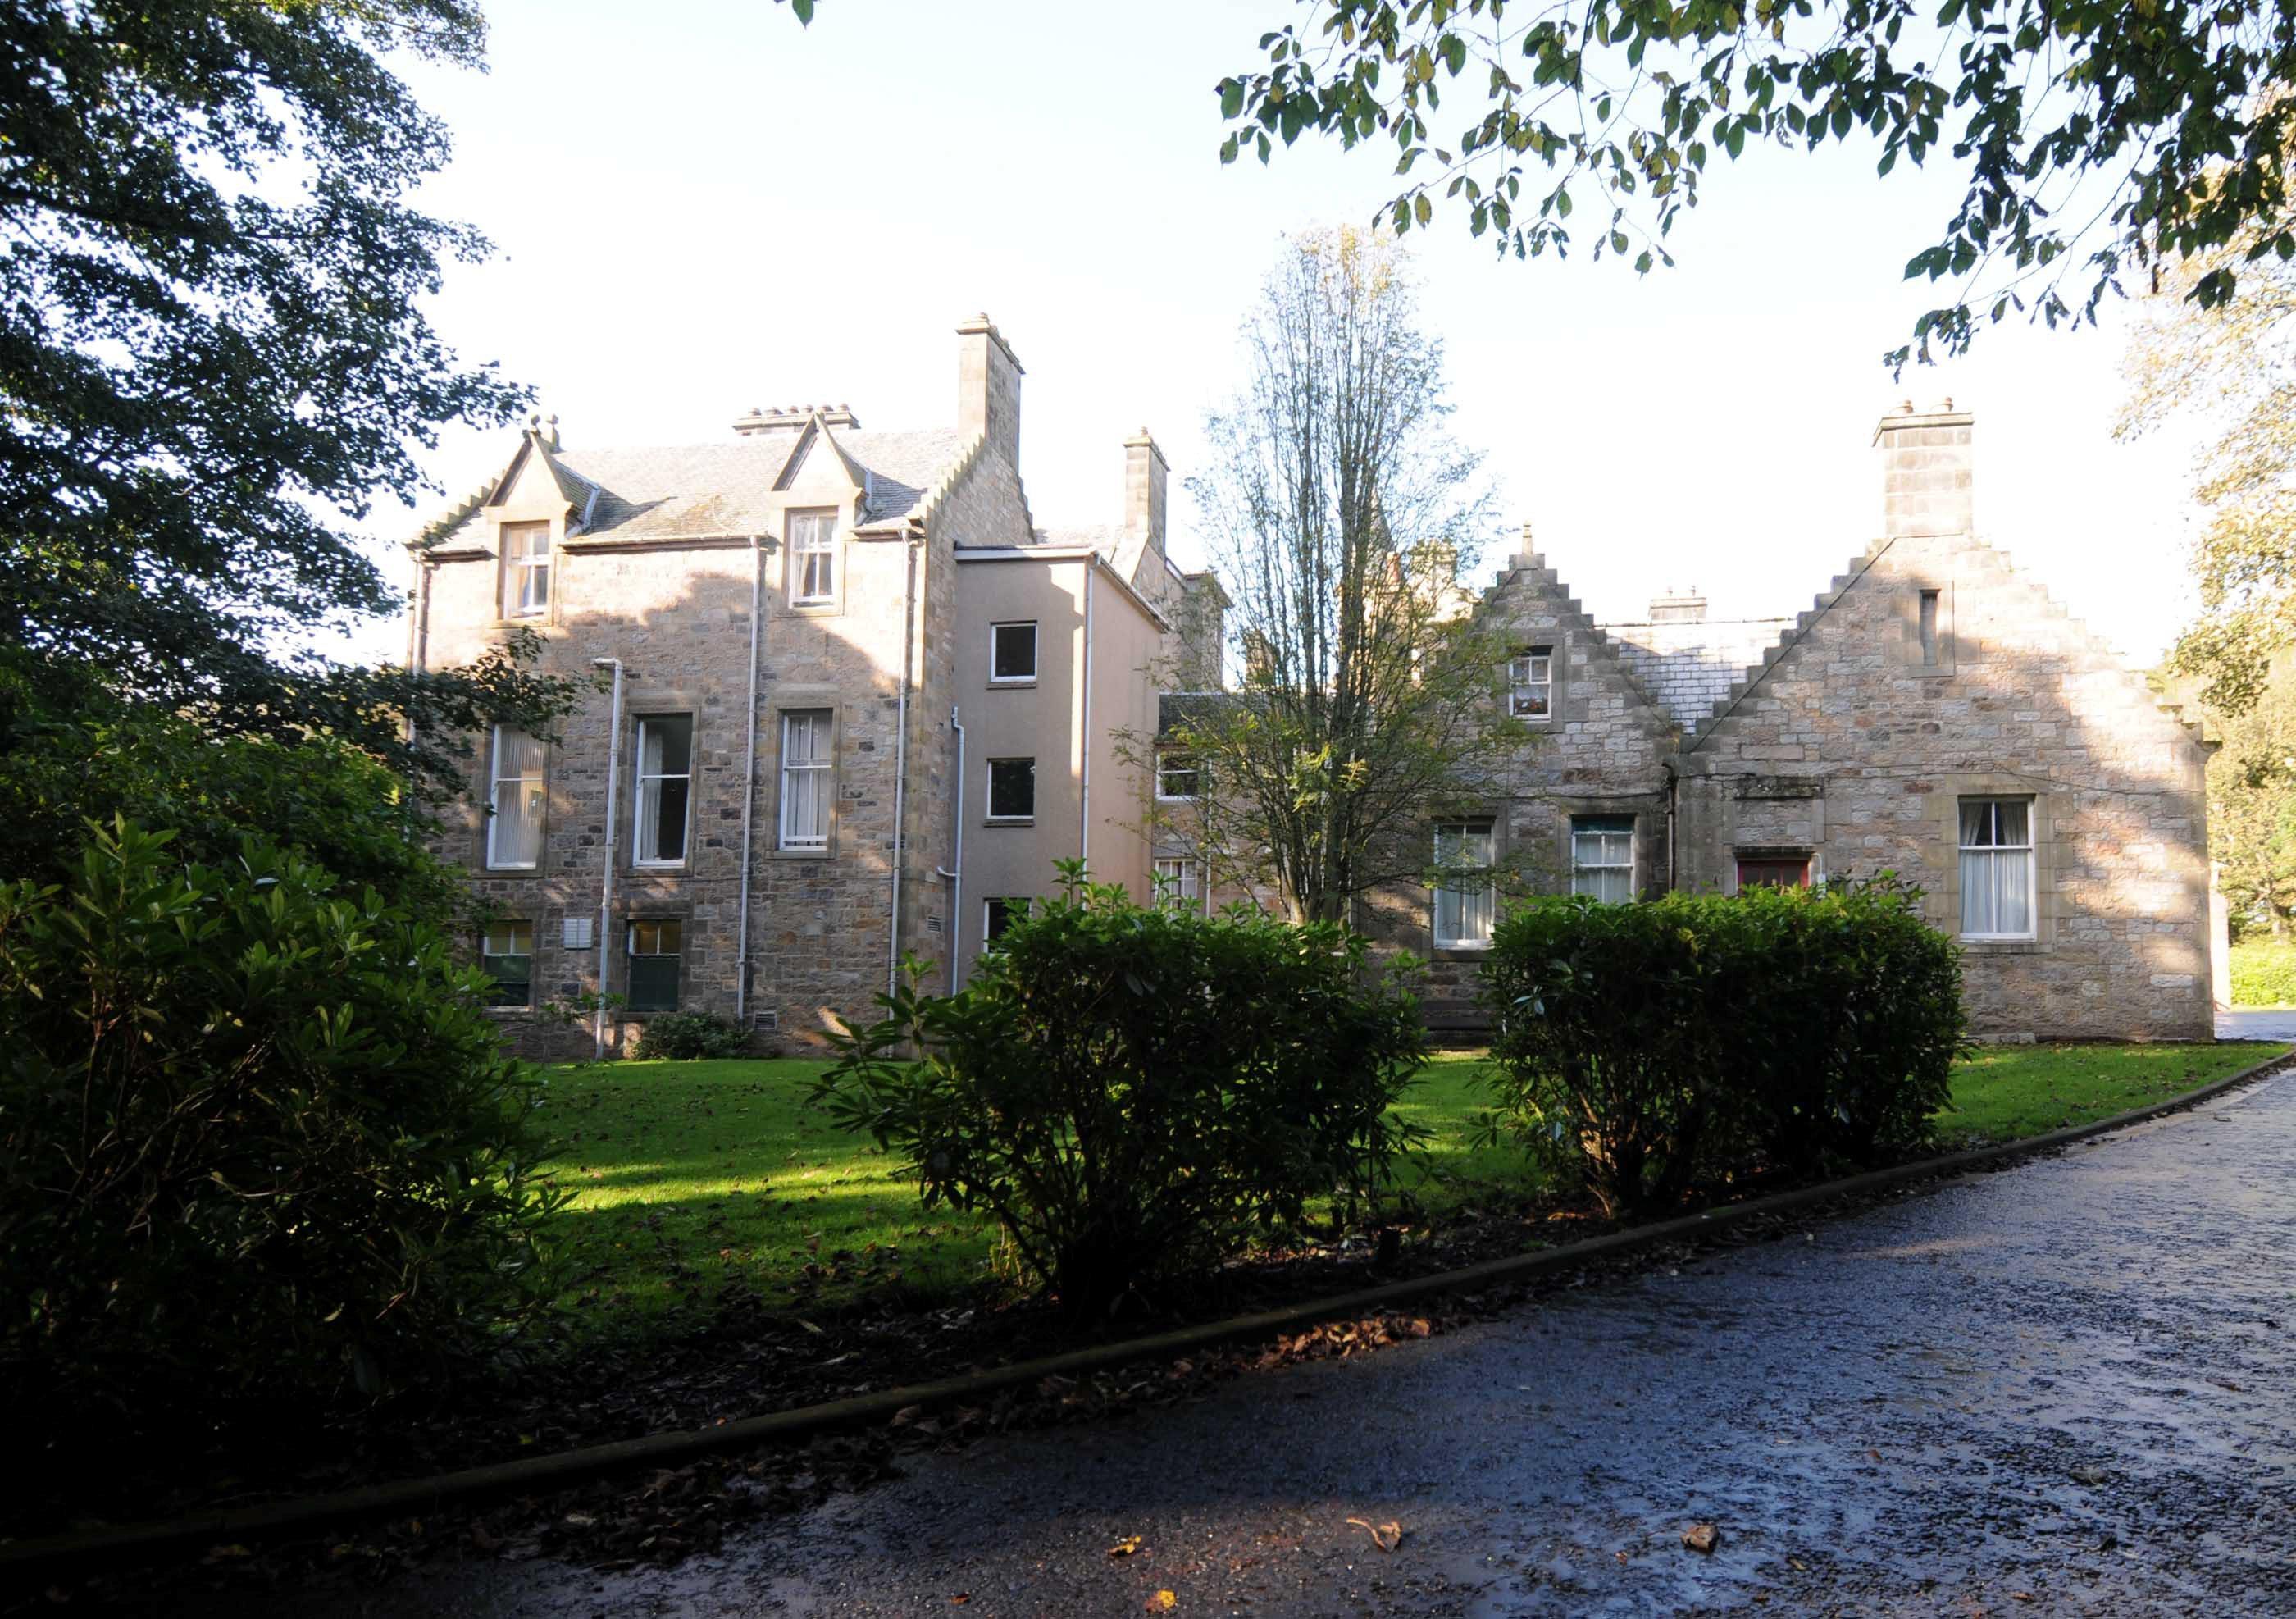 General Views of Balmedie House care home in Balmedie, Aberdeenshire.